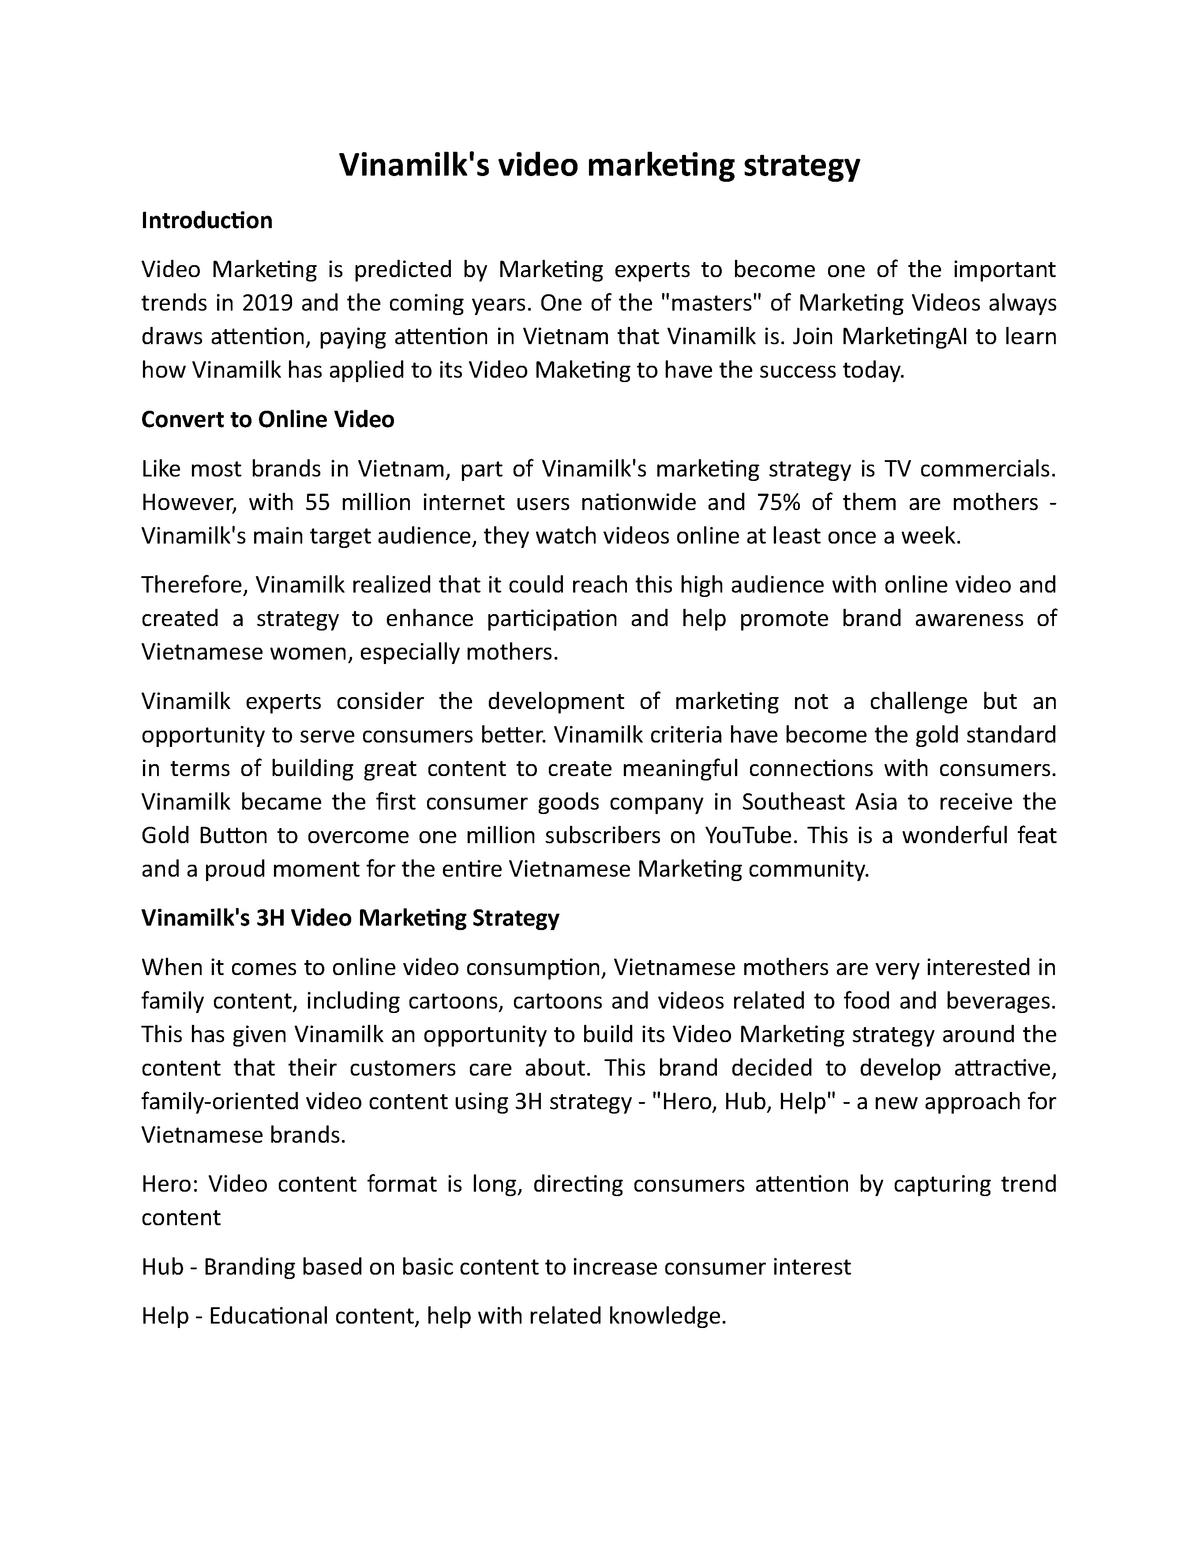 Vinamilk's video marketing strategy - ME - StuDocu